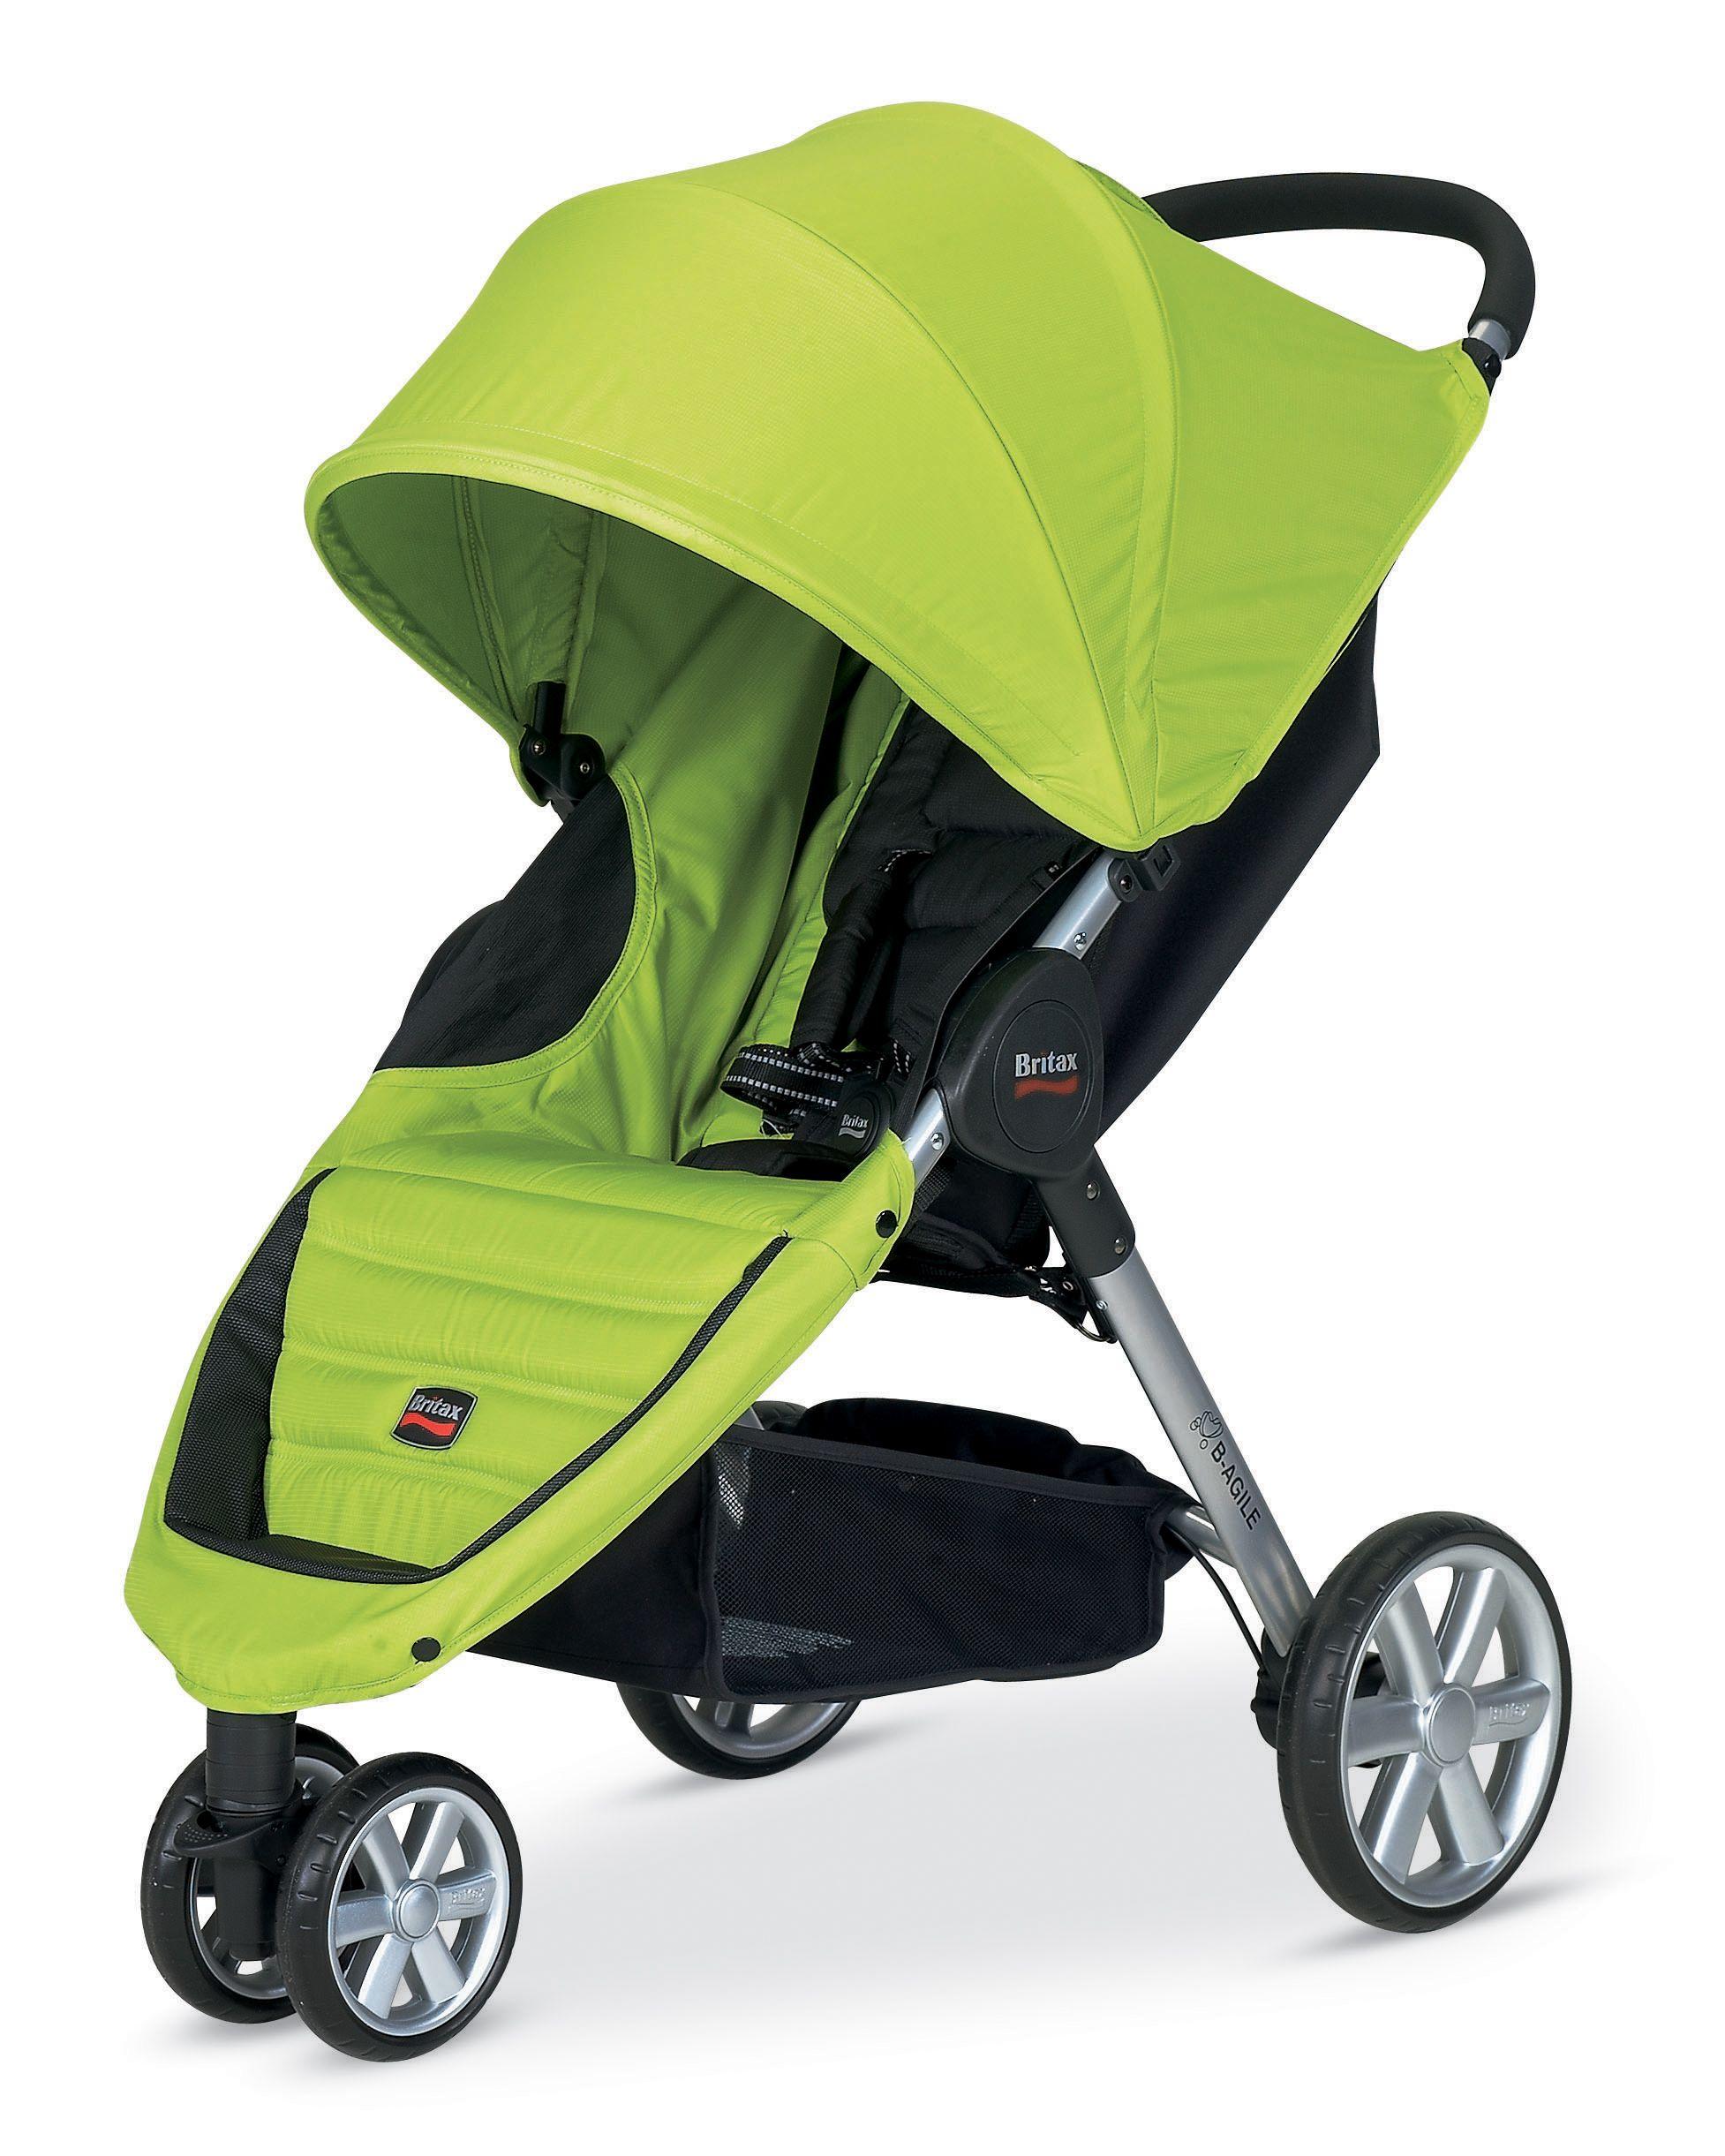 Britax BAgile Kiwi Baby strollers, Britax stroller